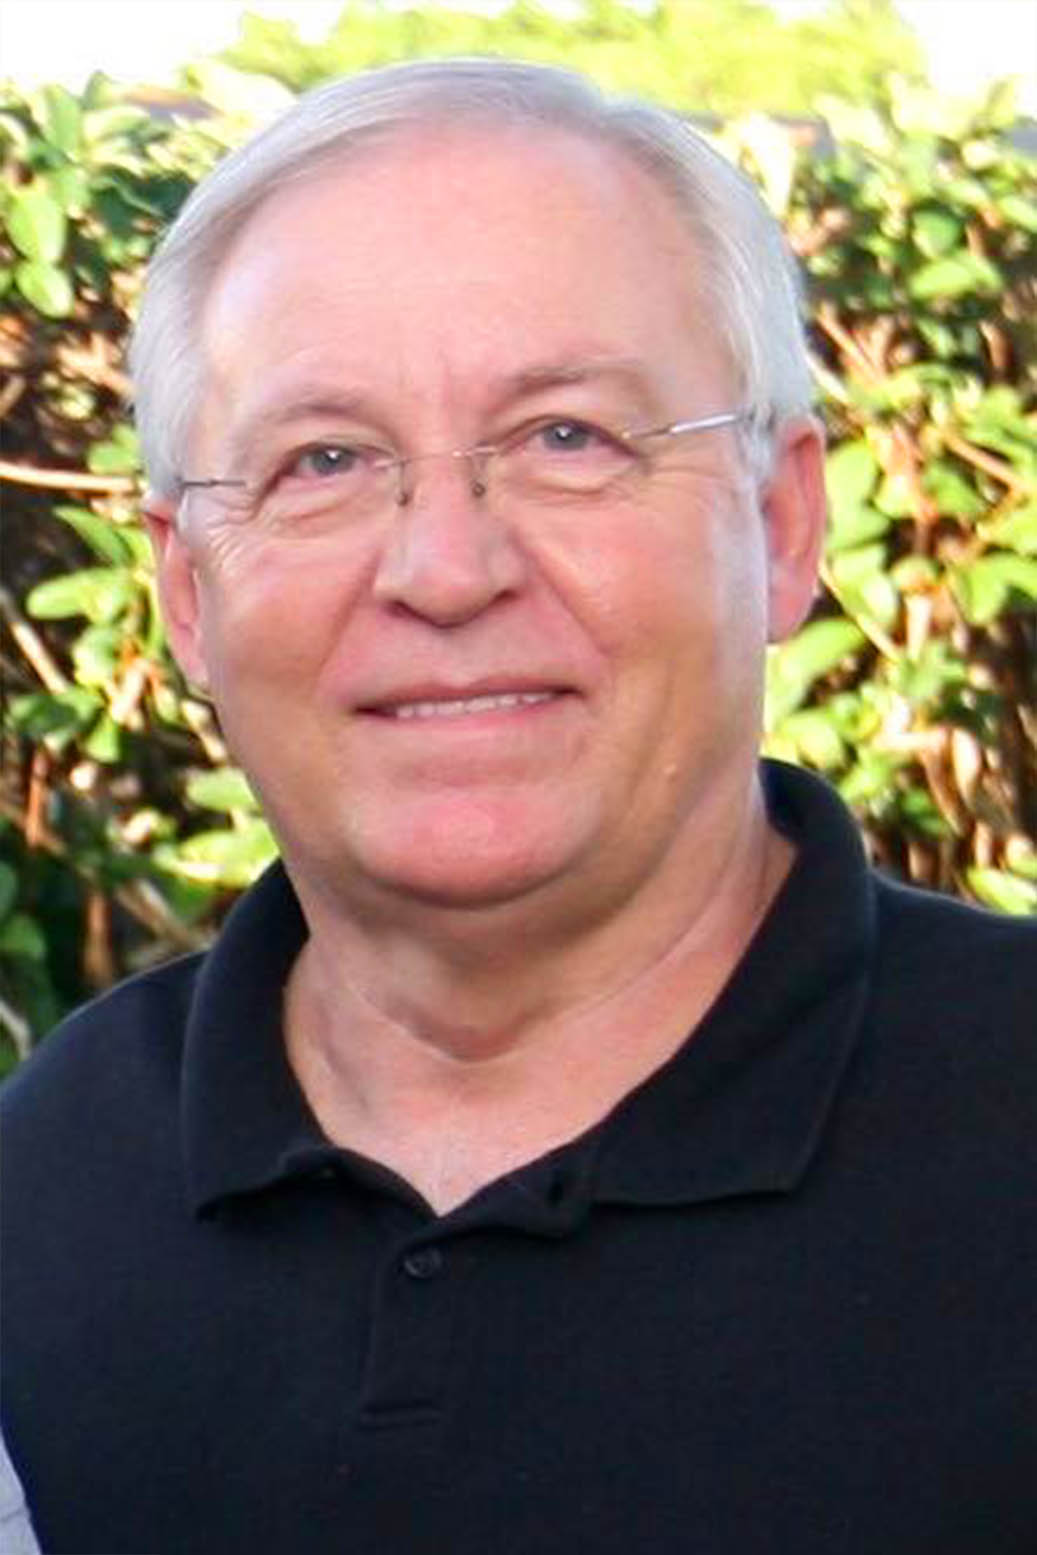 David Rowlson